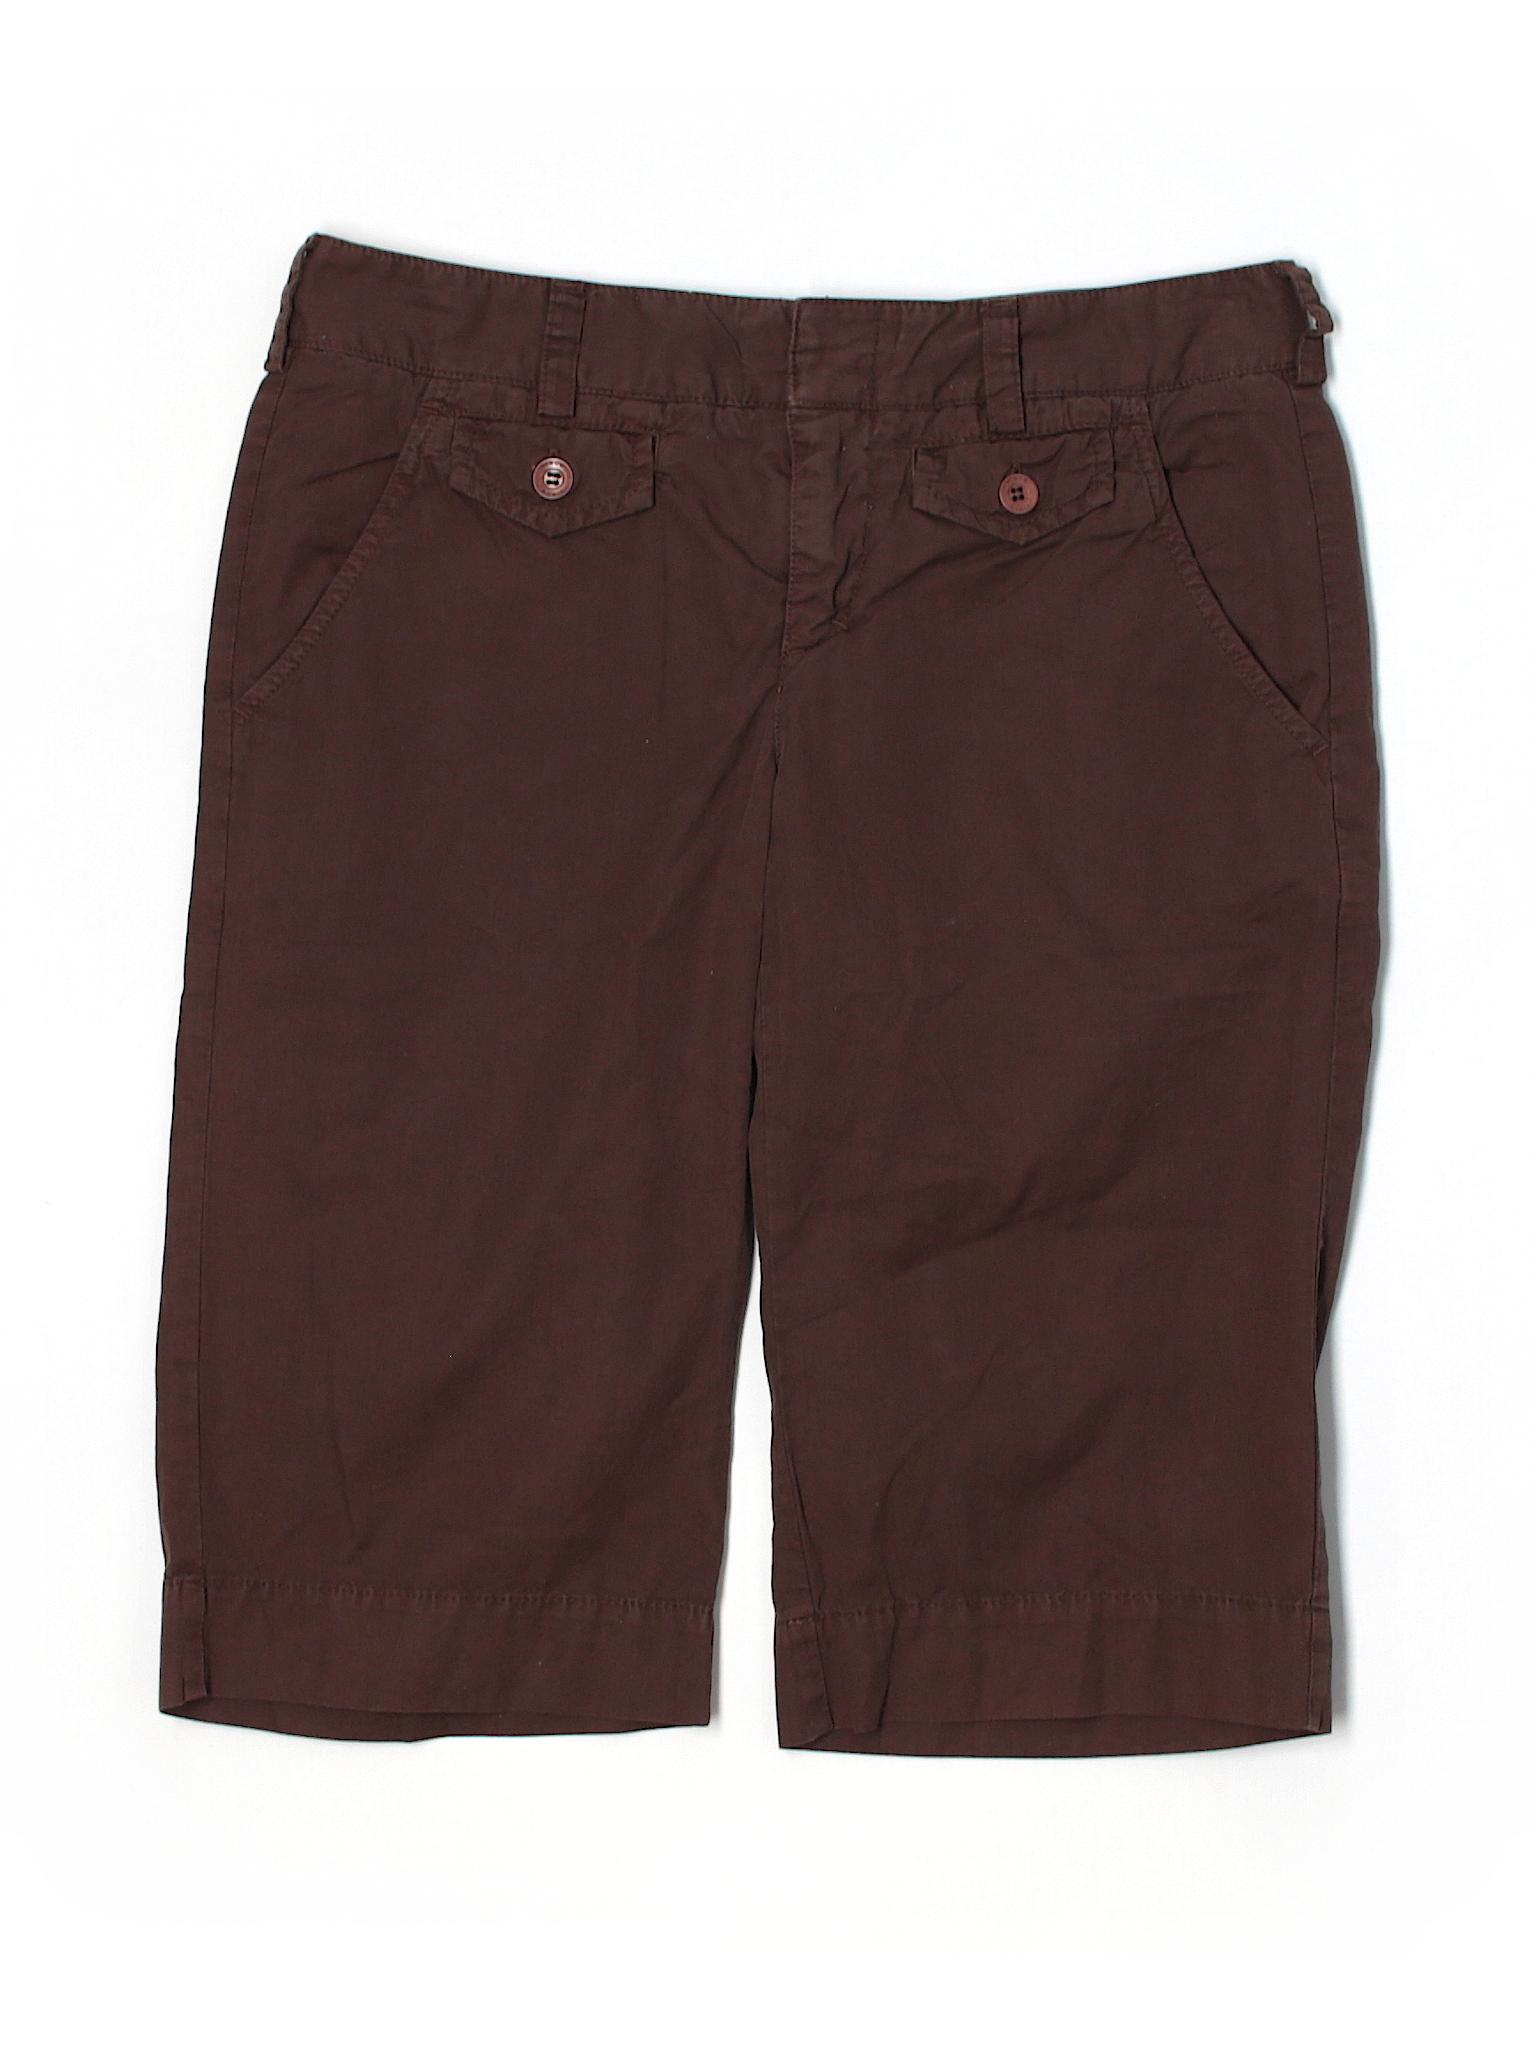 Khaki Vince Vince Khaki Khaki Shorts Shorts Boutique Boutique Boutique Shorts Vince xSqqUPIp